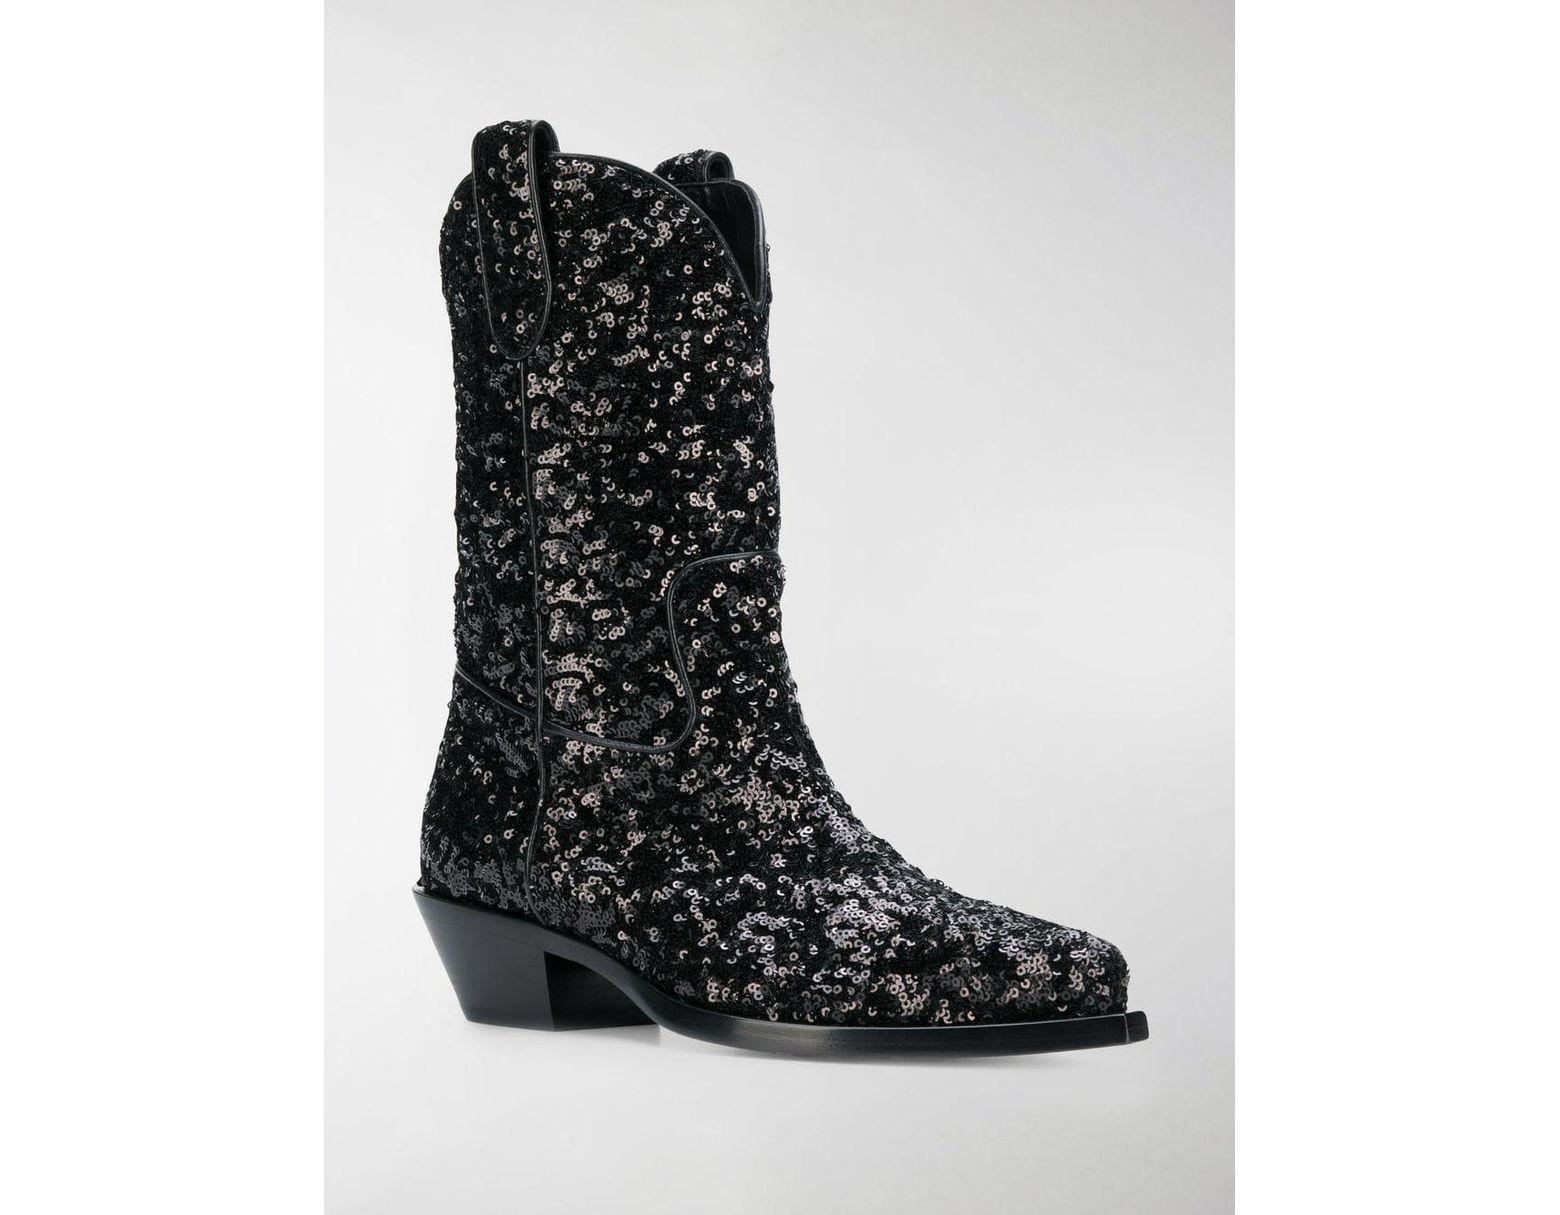 ffc38980e91 Women's Black Gaucho 40 Sequined Cowboy Boots